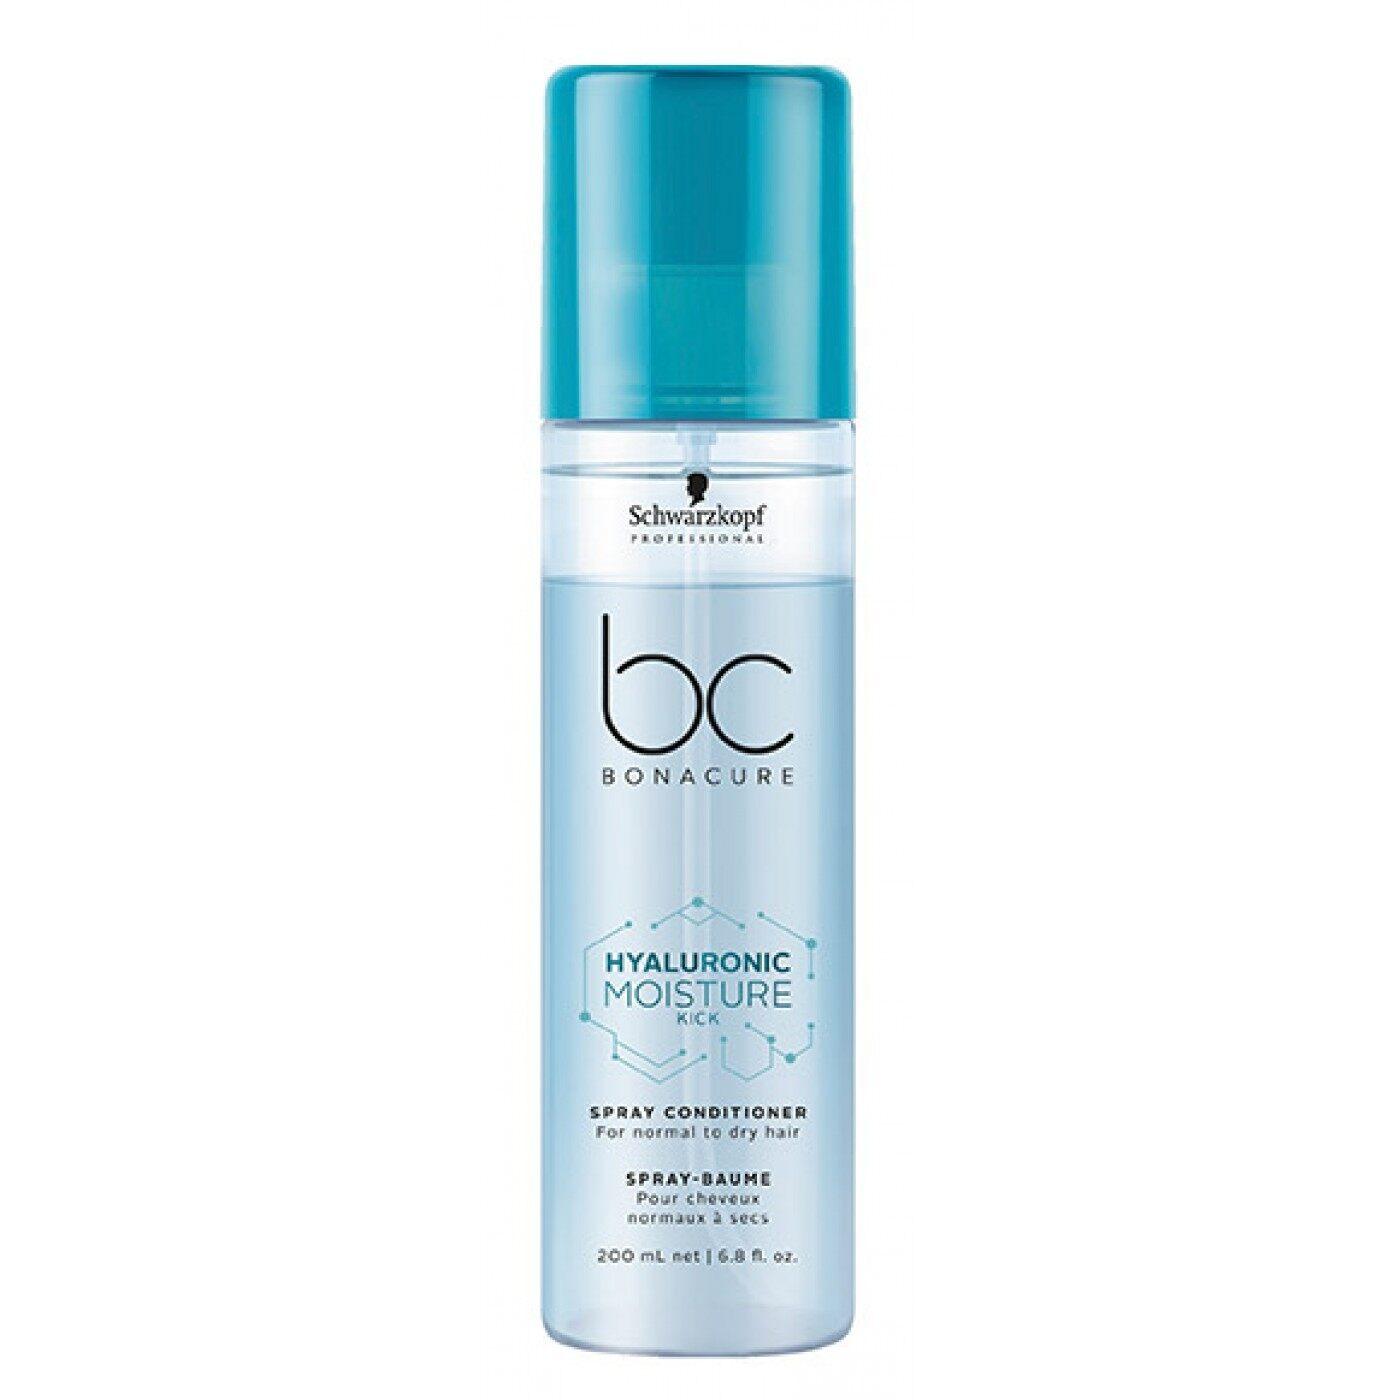 Schwarzkopf BC Bonacure Moisture Kick Spray Conditioner